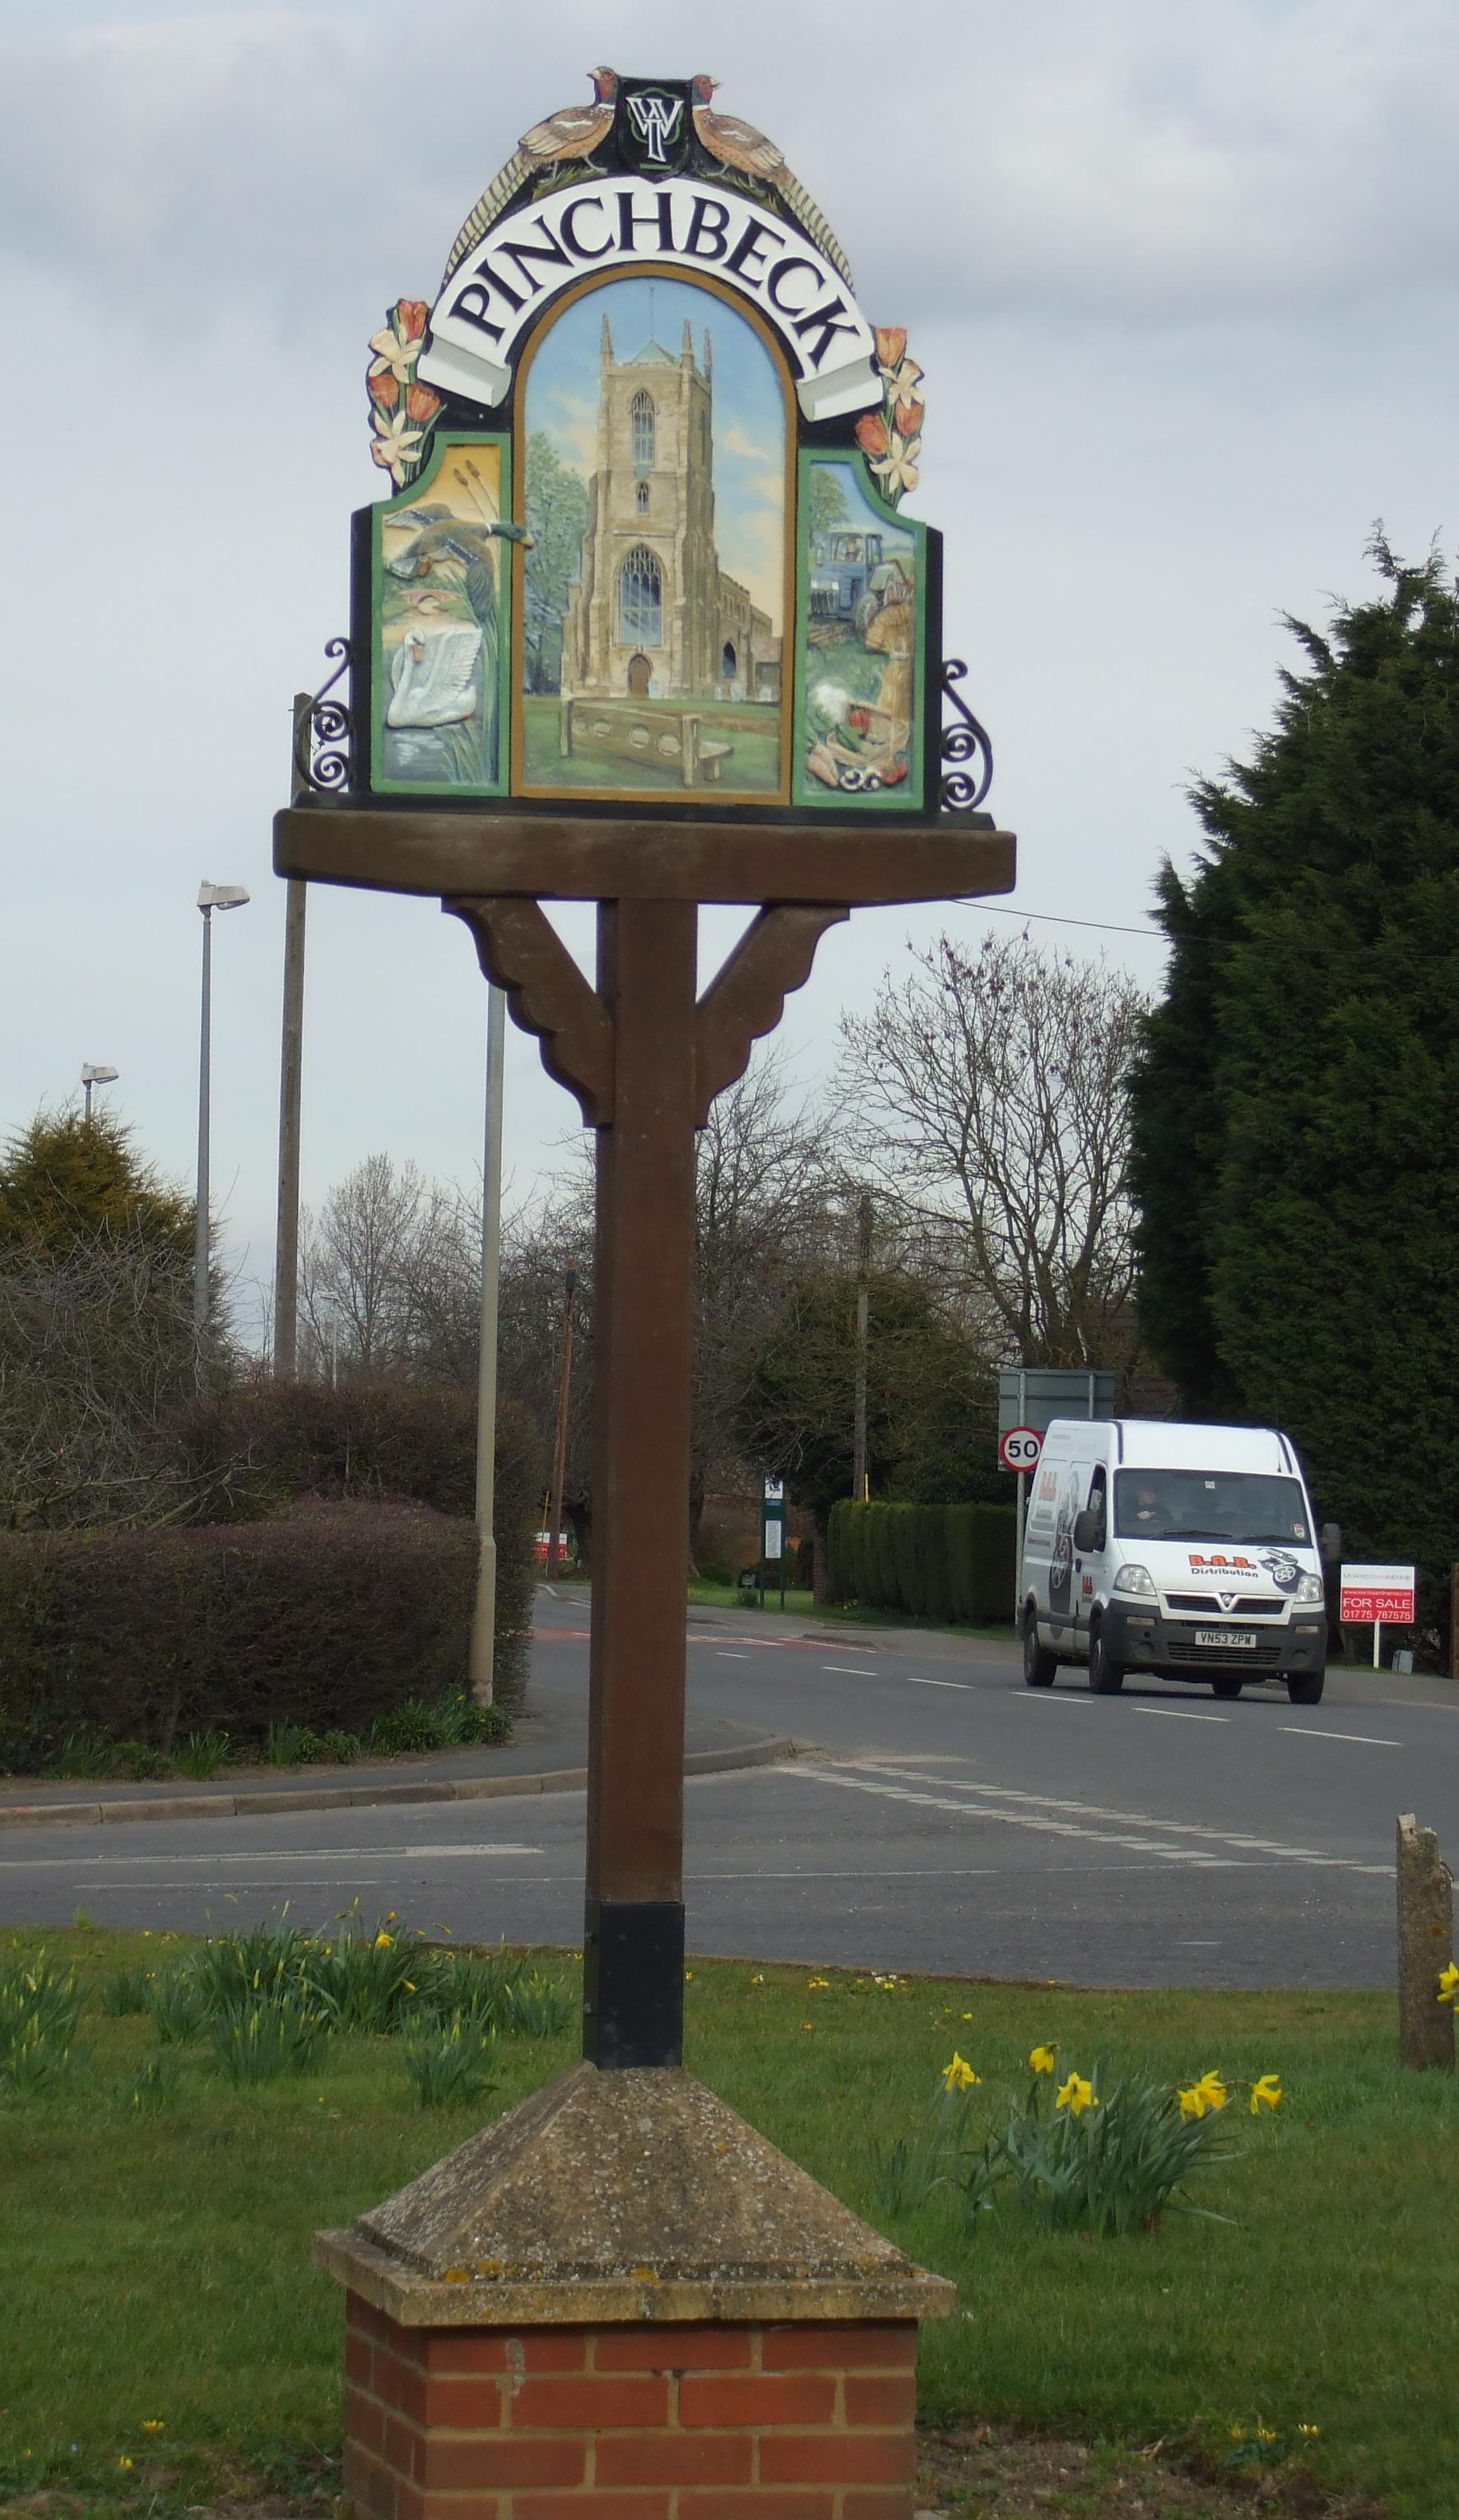 Pinchbeck sign